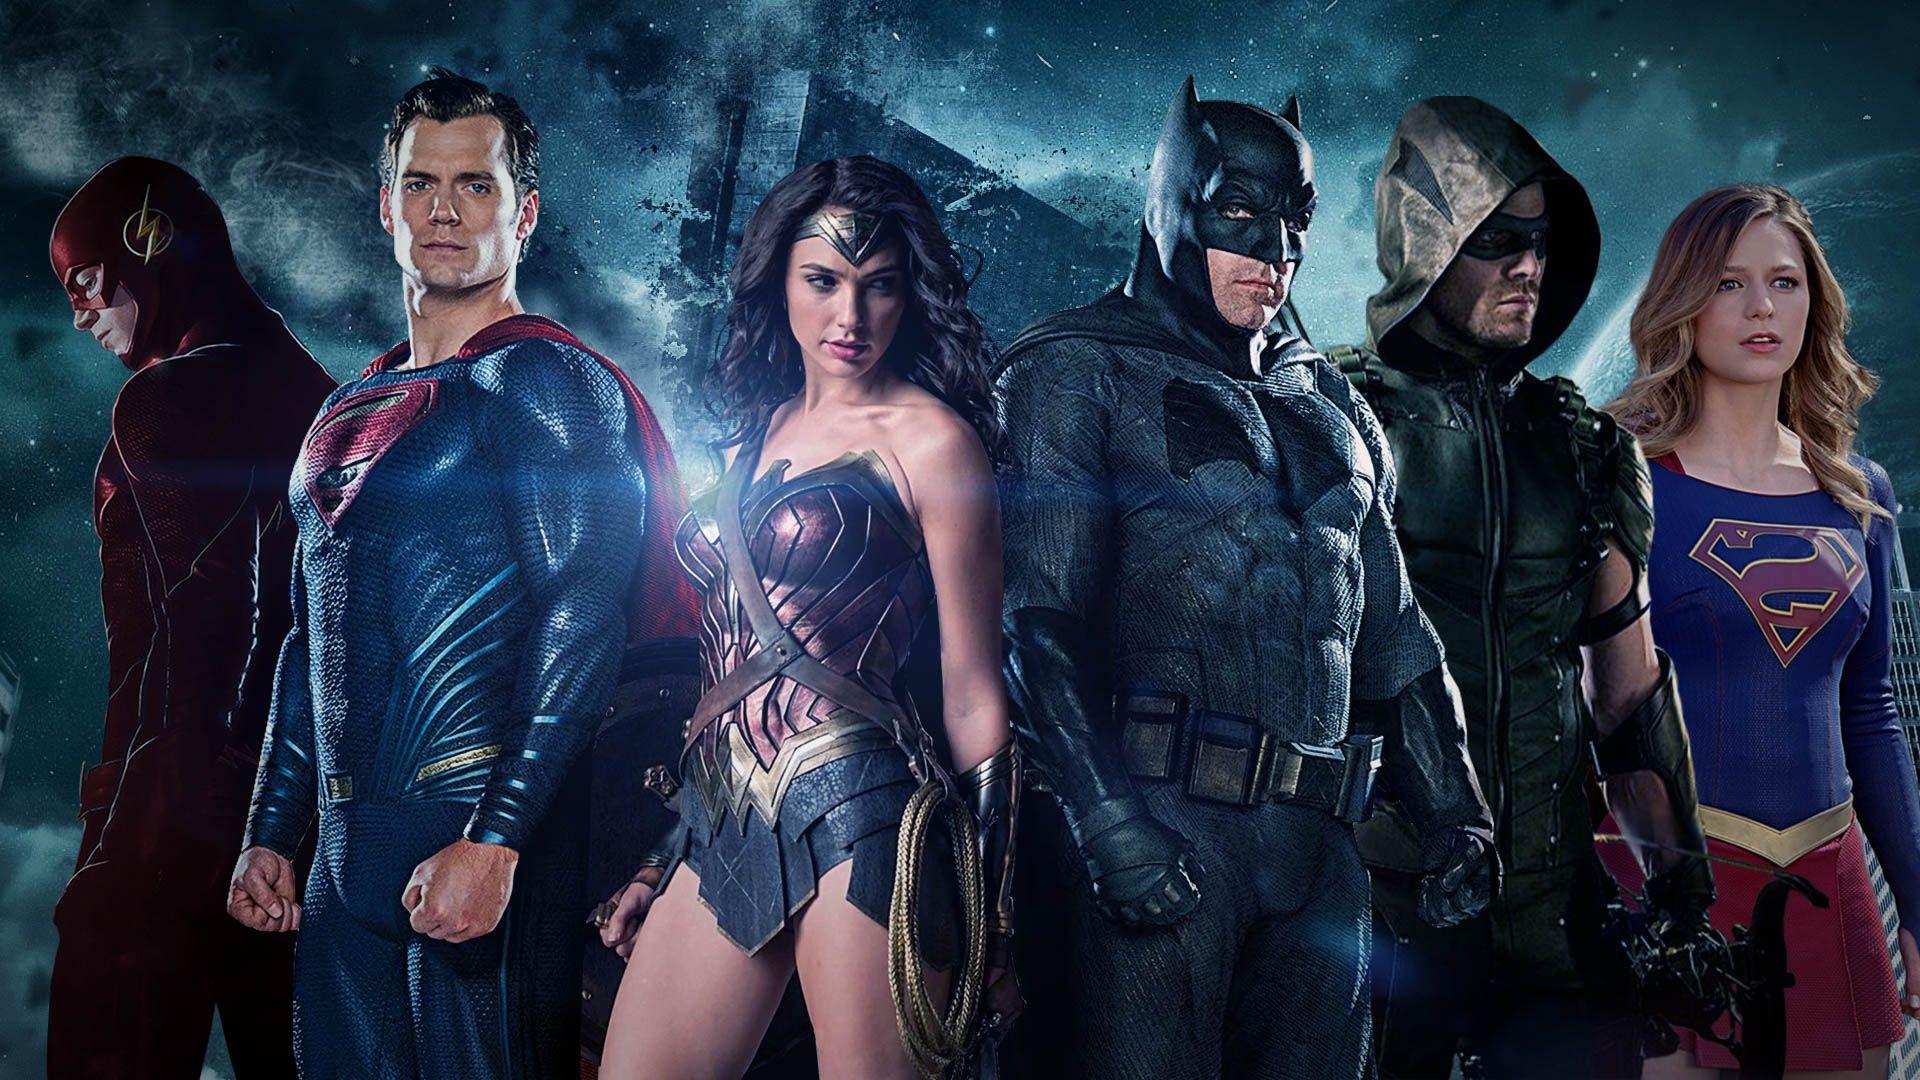 justice league batman wallpapers